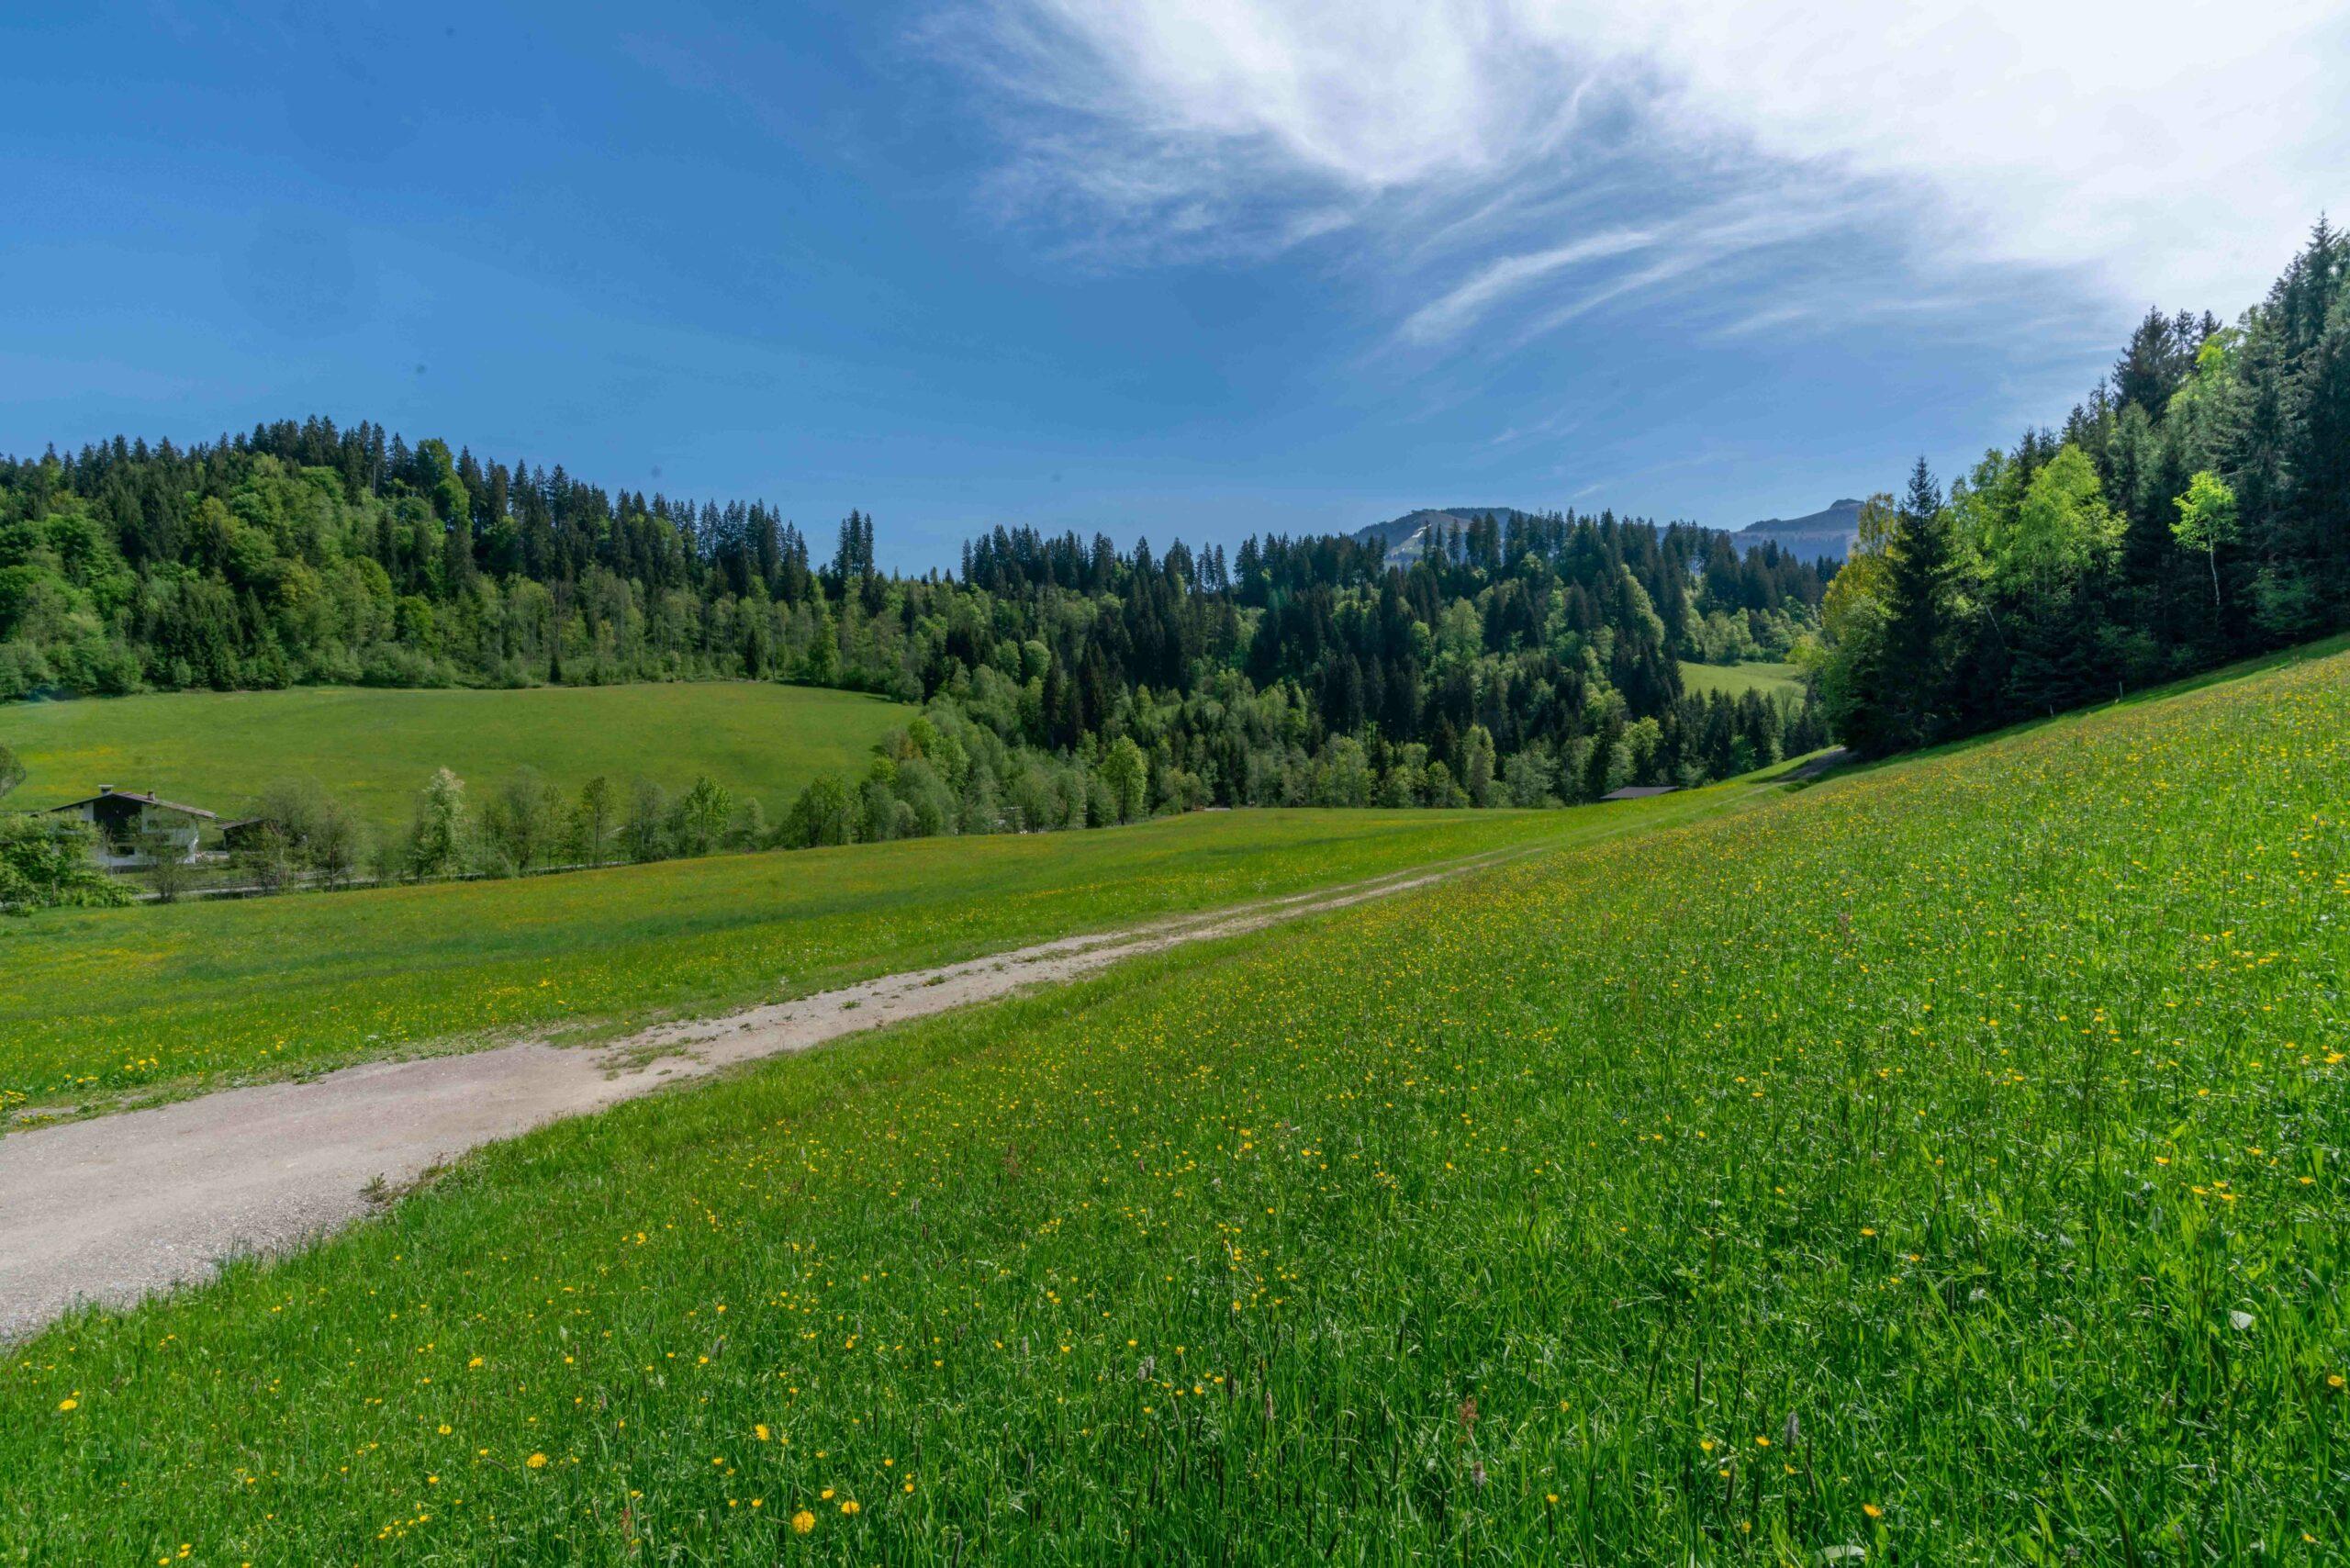 Getznerhof Blick in die Natur